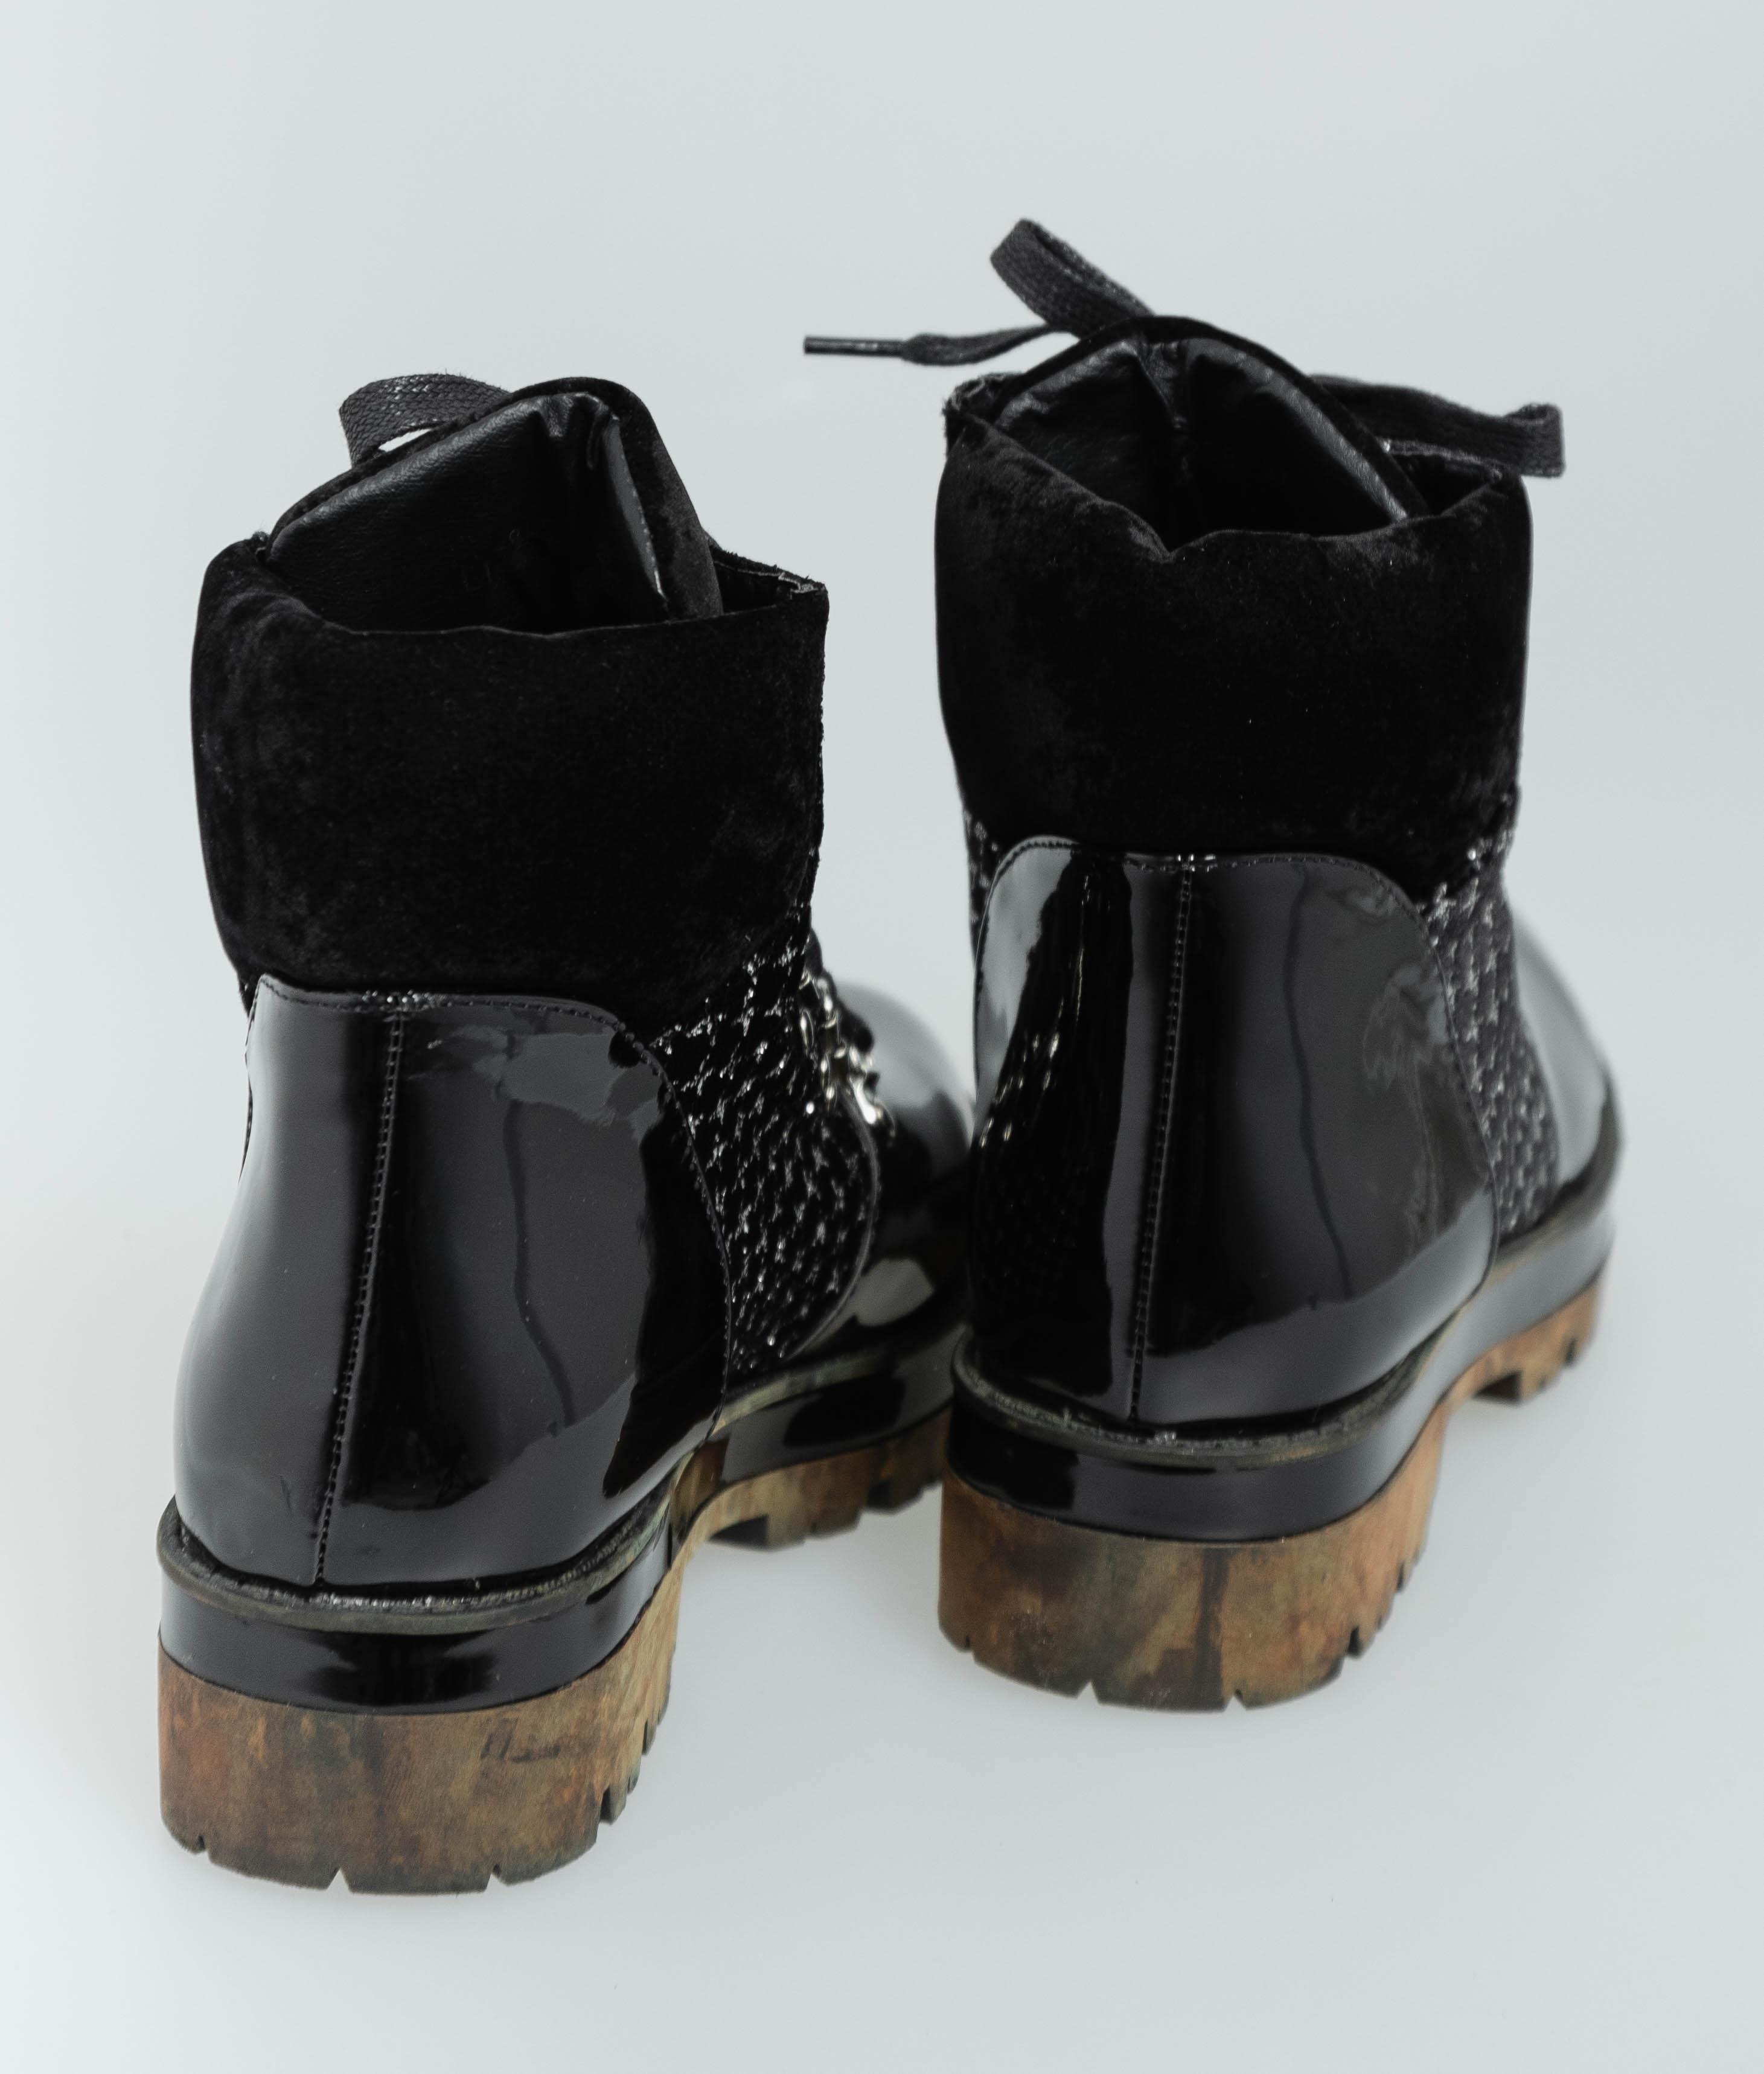 Bota Baja Campy - Negro